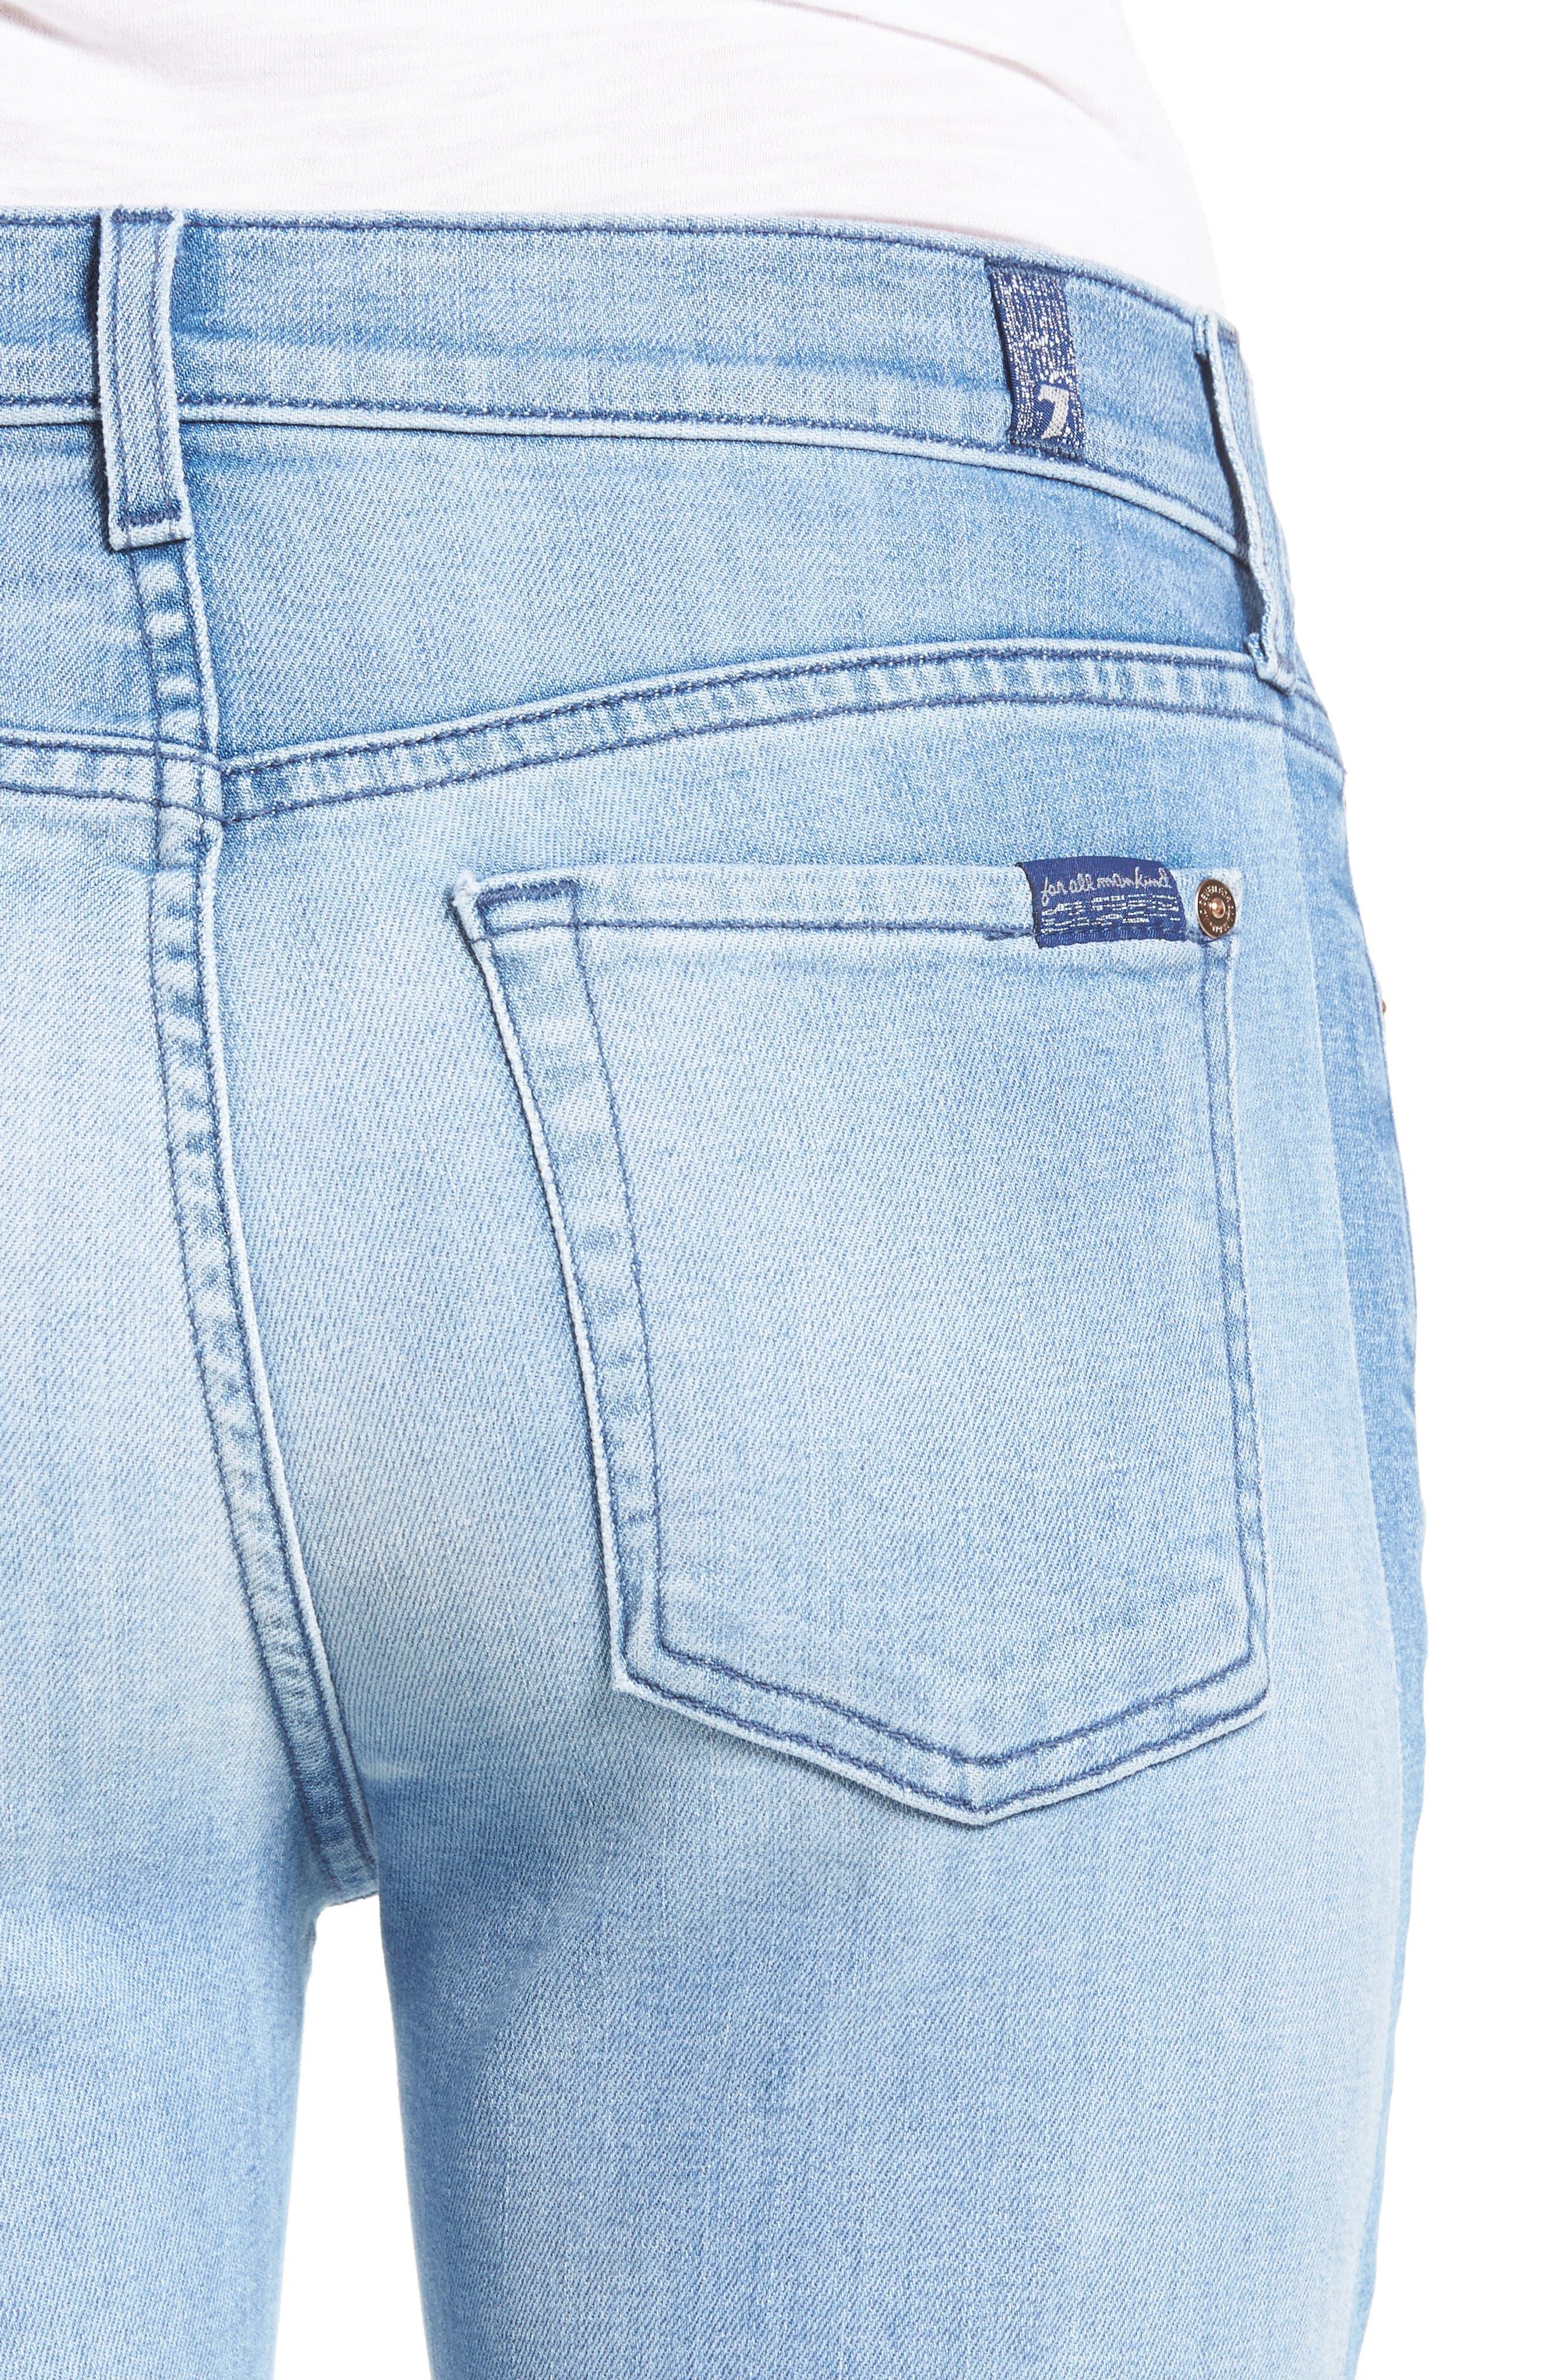 Roxanne Original Ankle Skinny Jeans,                             Alternate thumbnail 4, color,